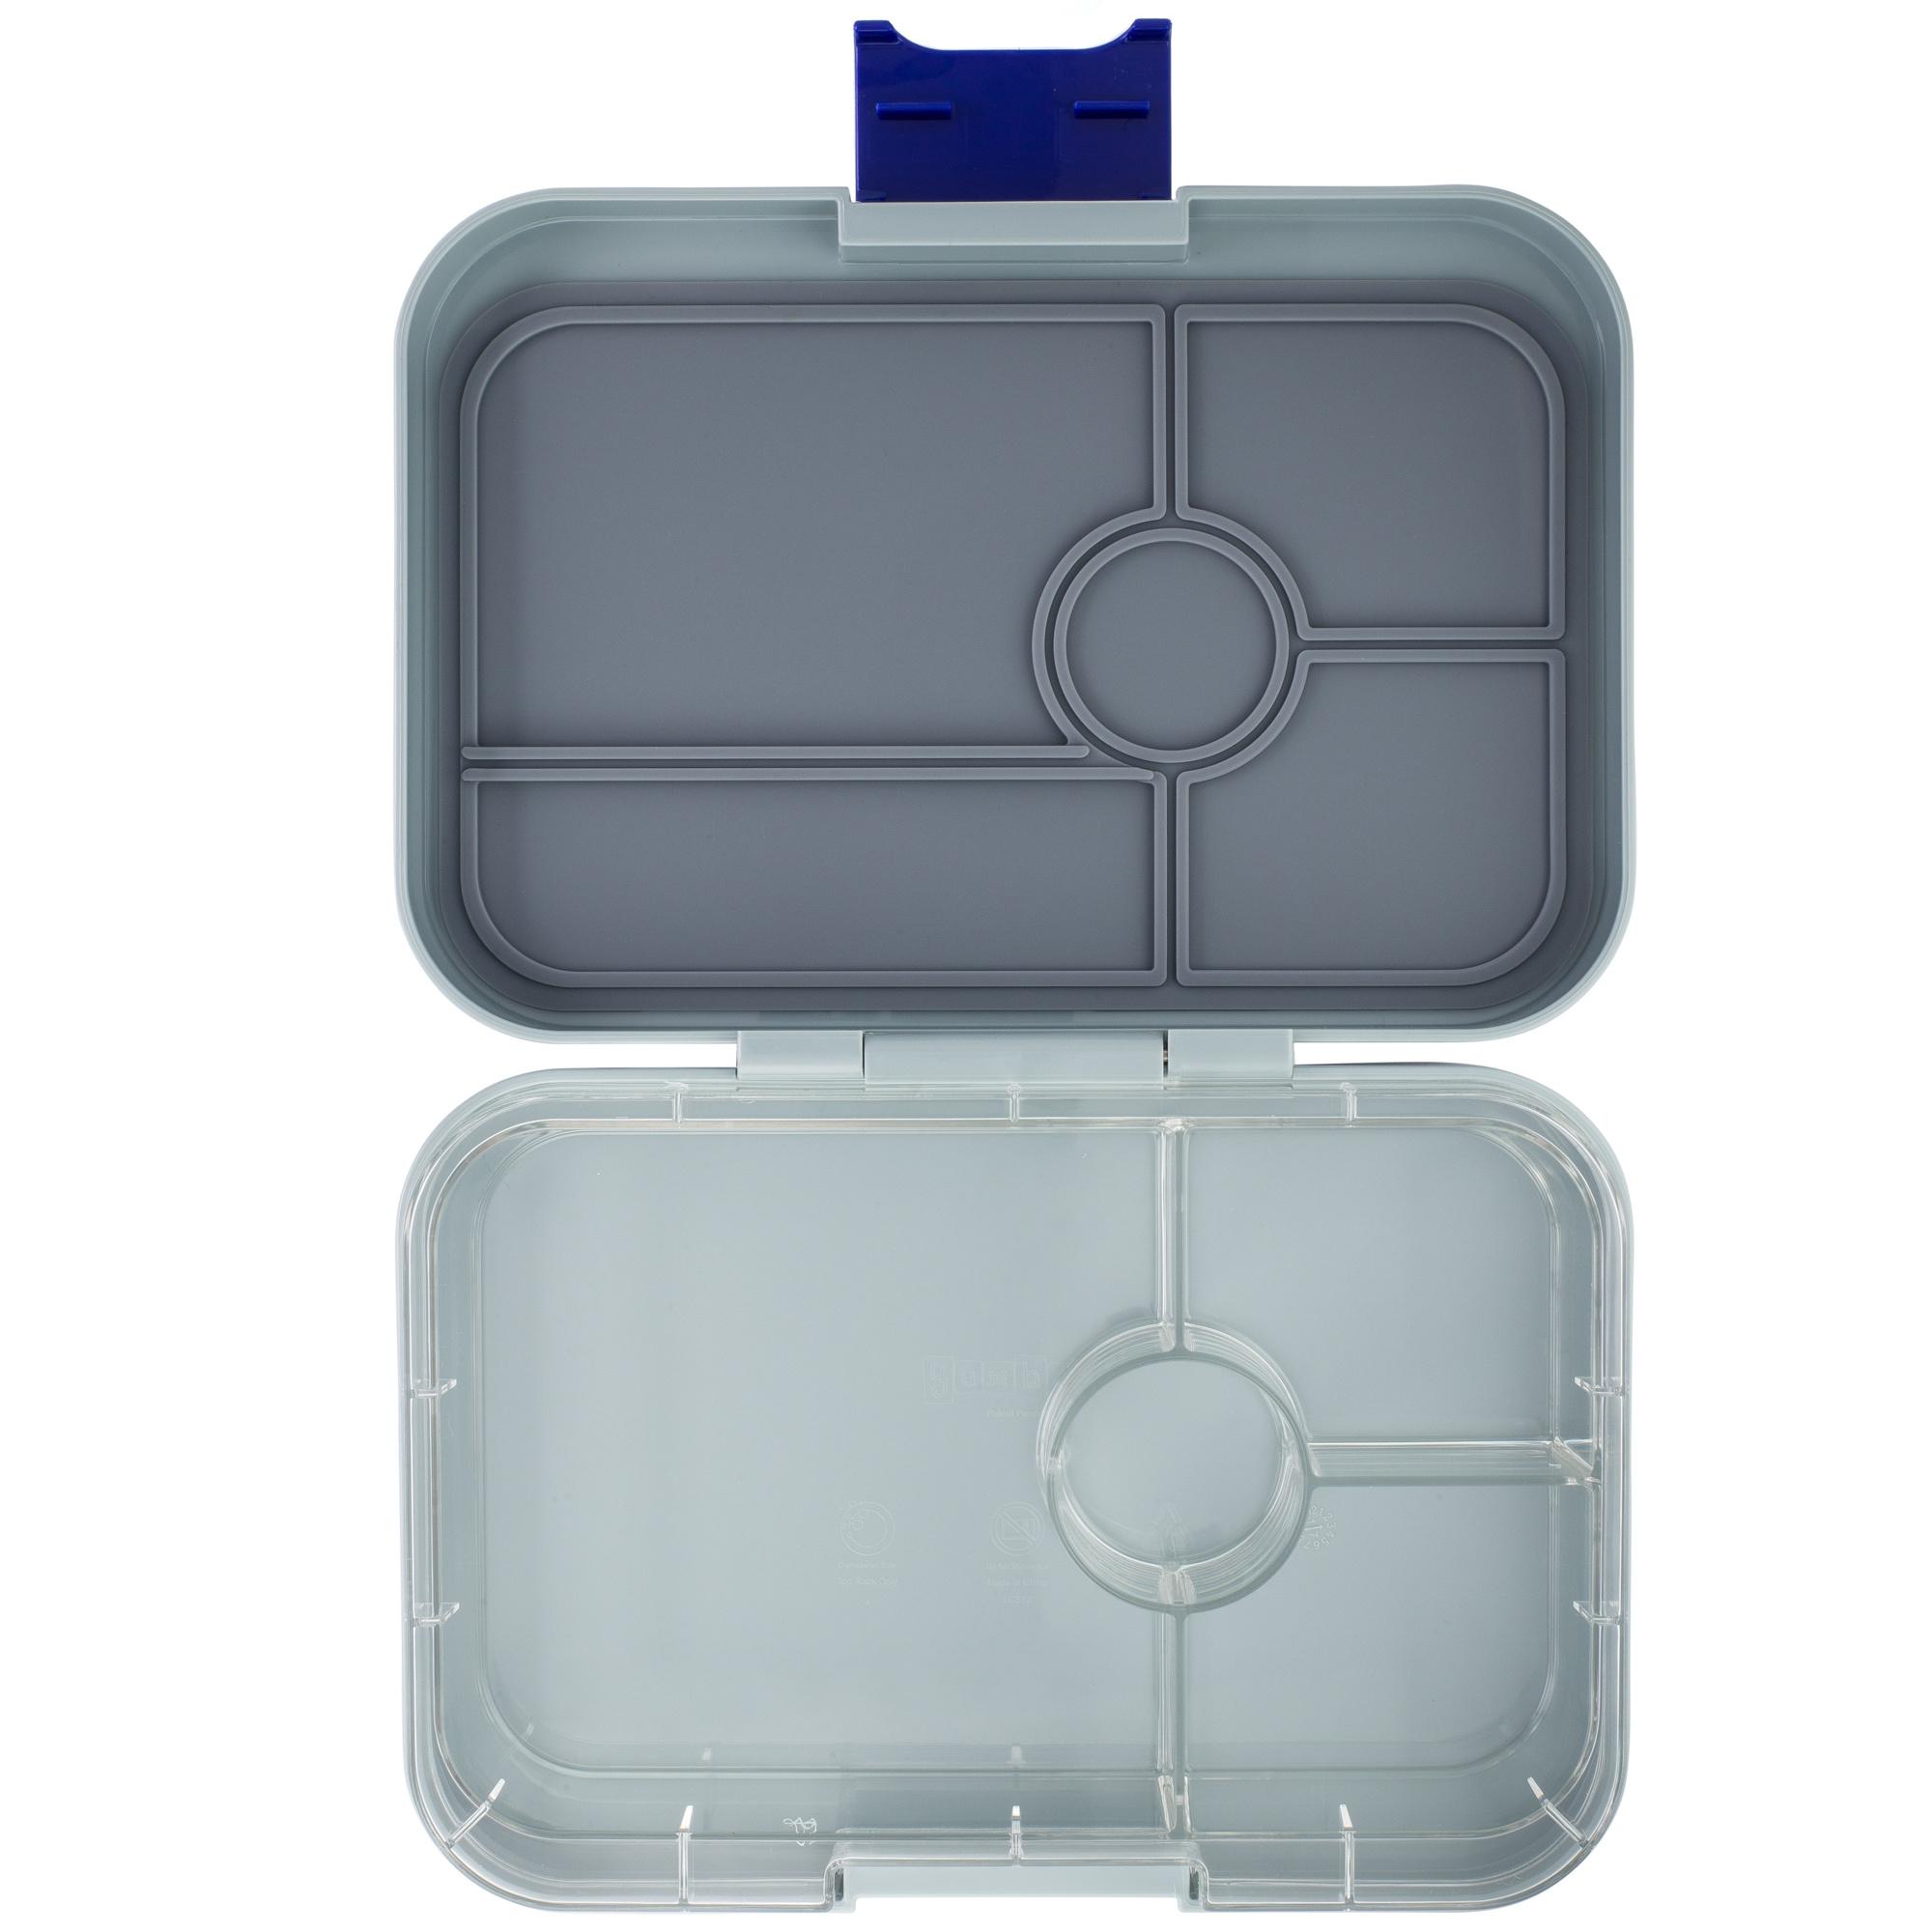 Yumbox Tapas XL lunchtrommel Flat Iron grijs / transparante tray 4 vakken-1